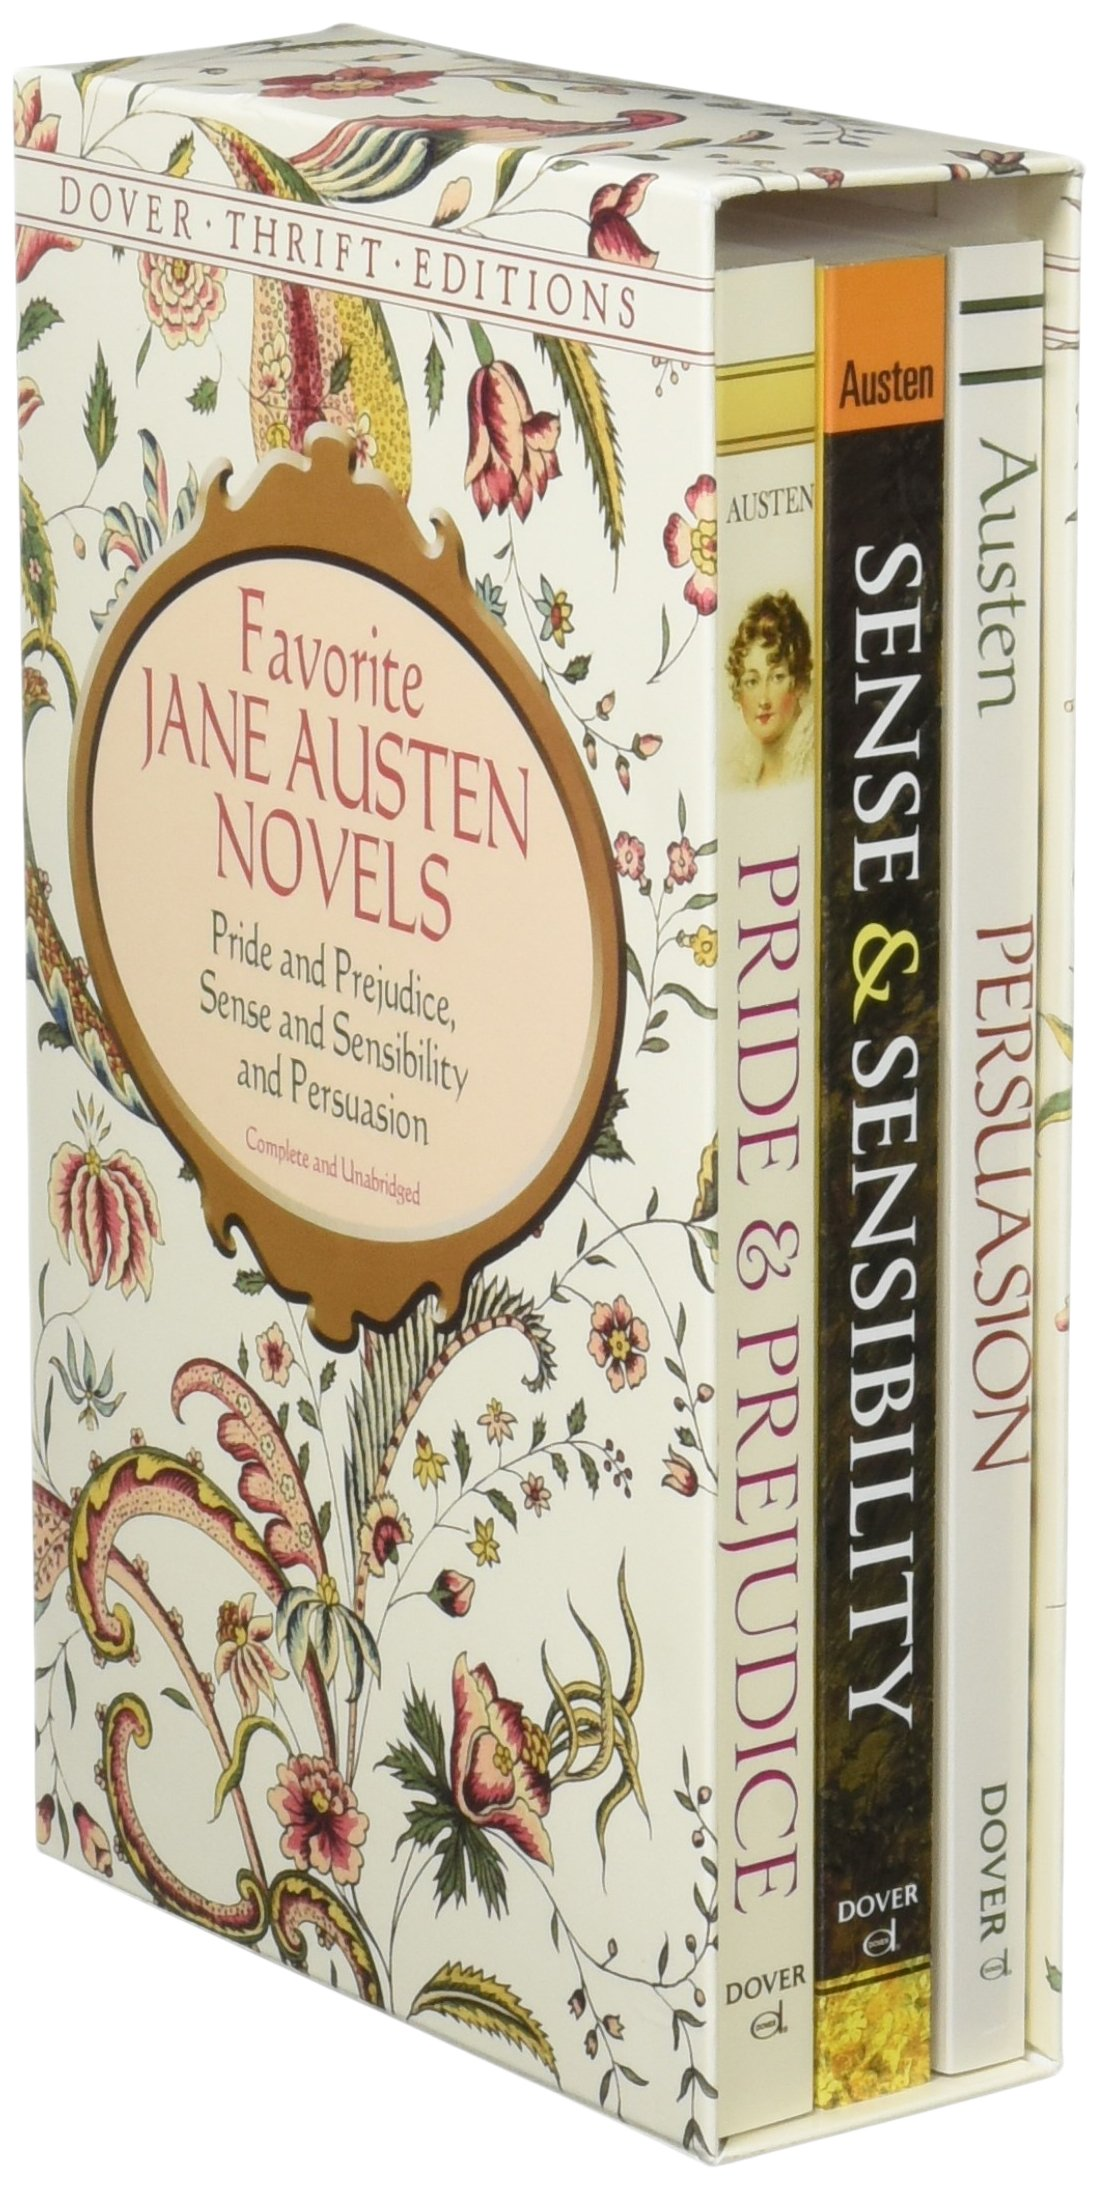 Favorite Jane Austen Novels Sensibility